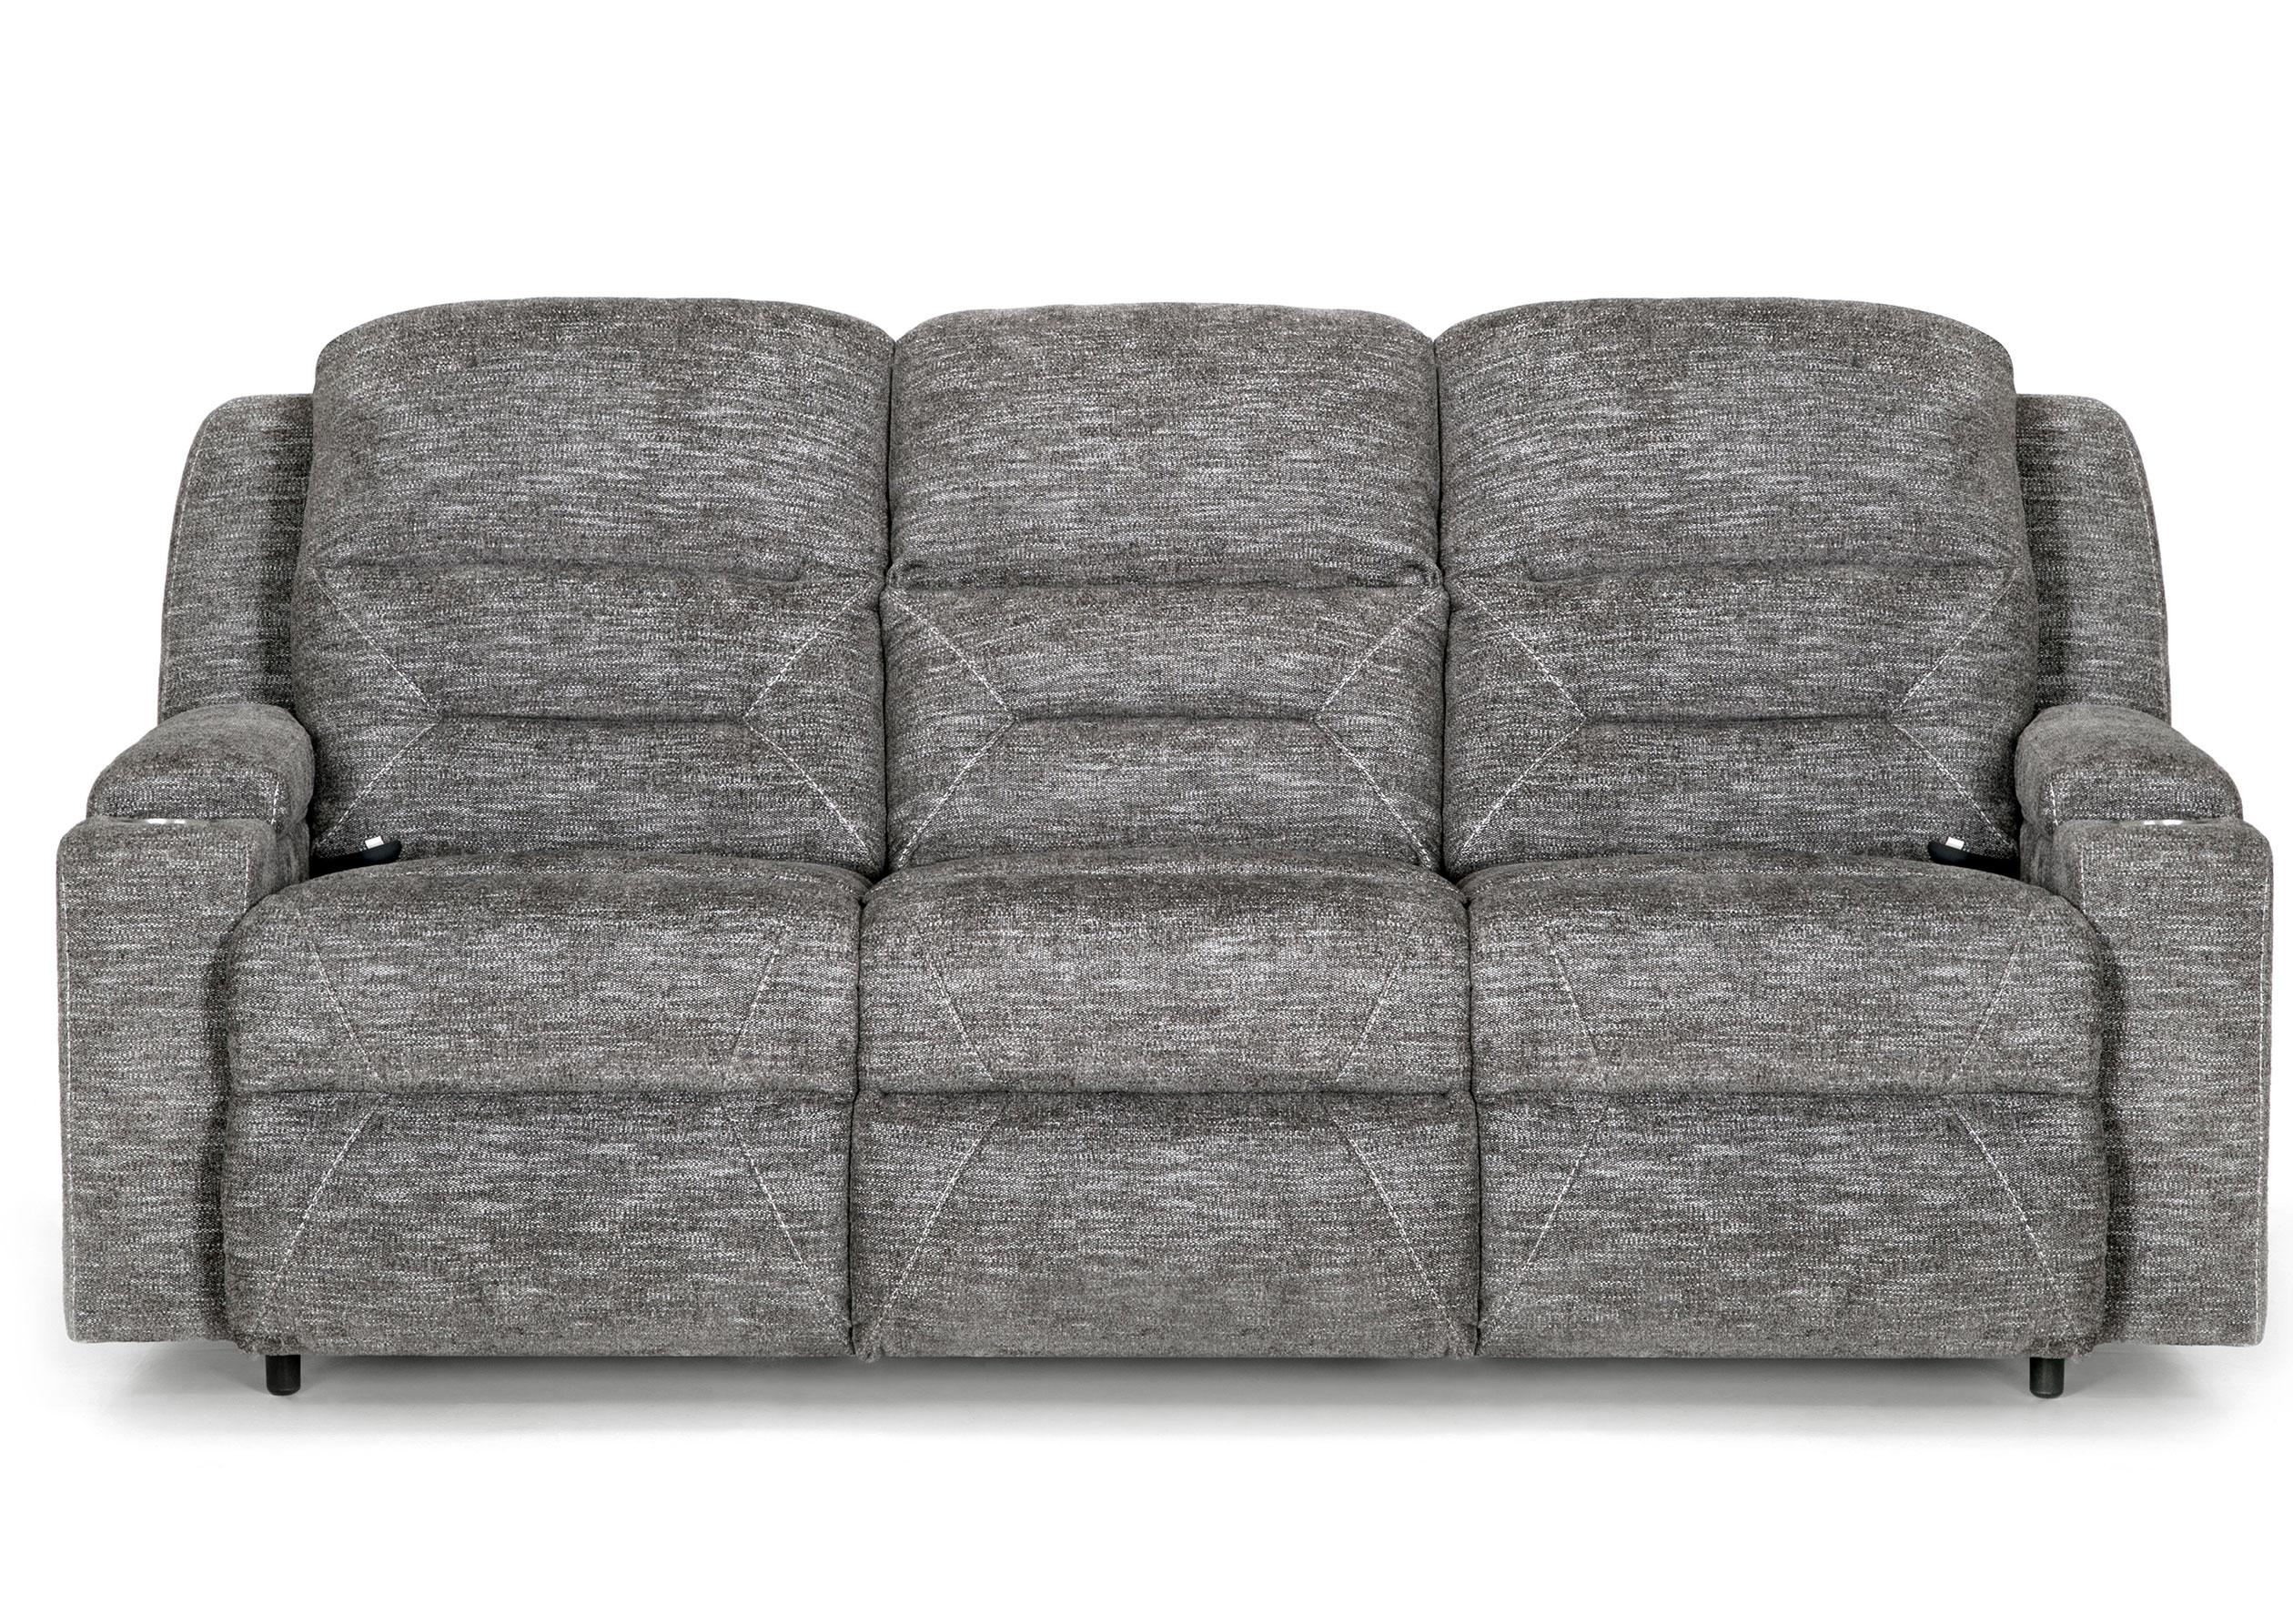 Enjoyable Beacon Reclining Sofa W Power Recline Power Sofas And Machost Co Dining Chair Design Ideas Machostcouk